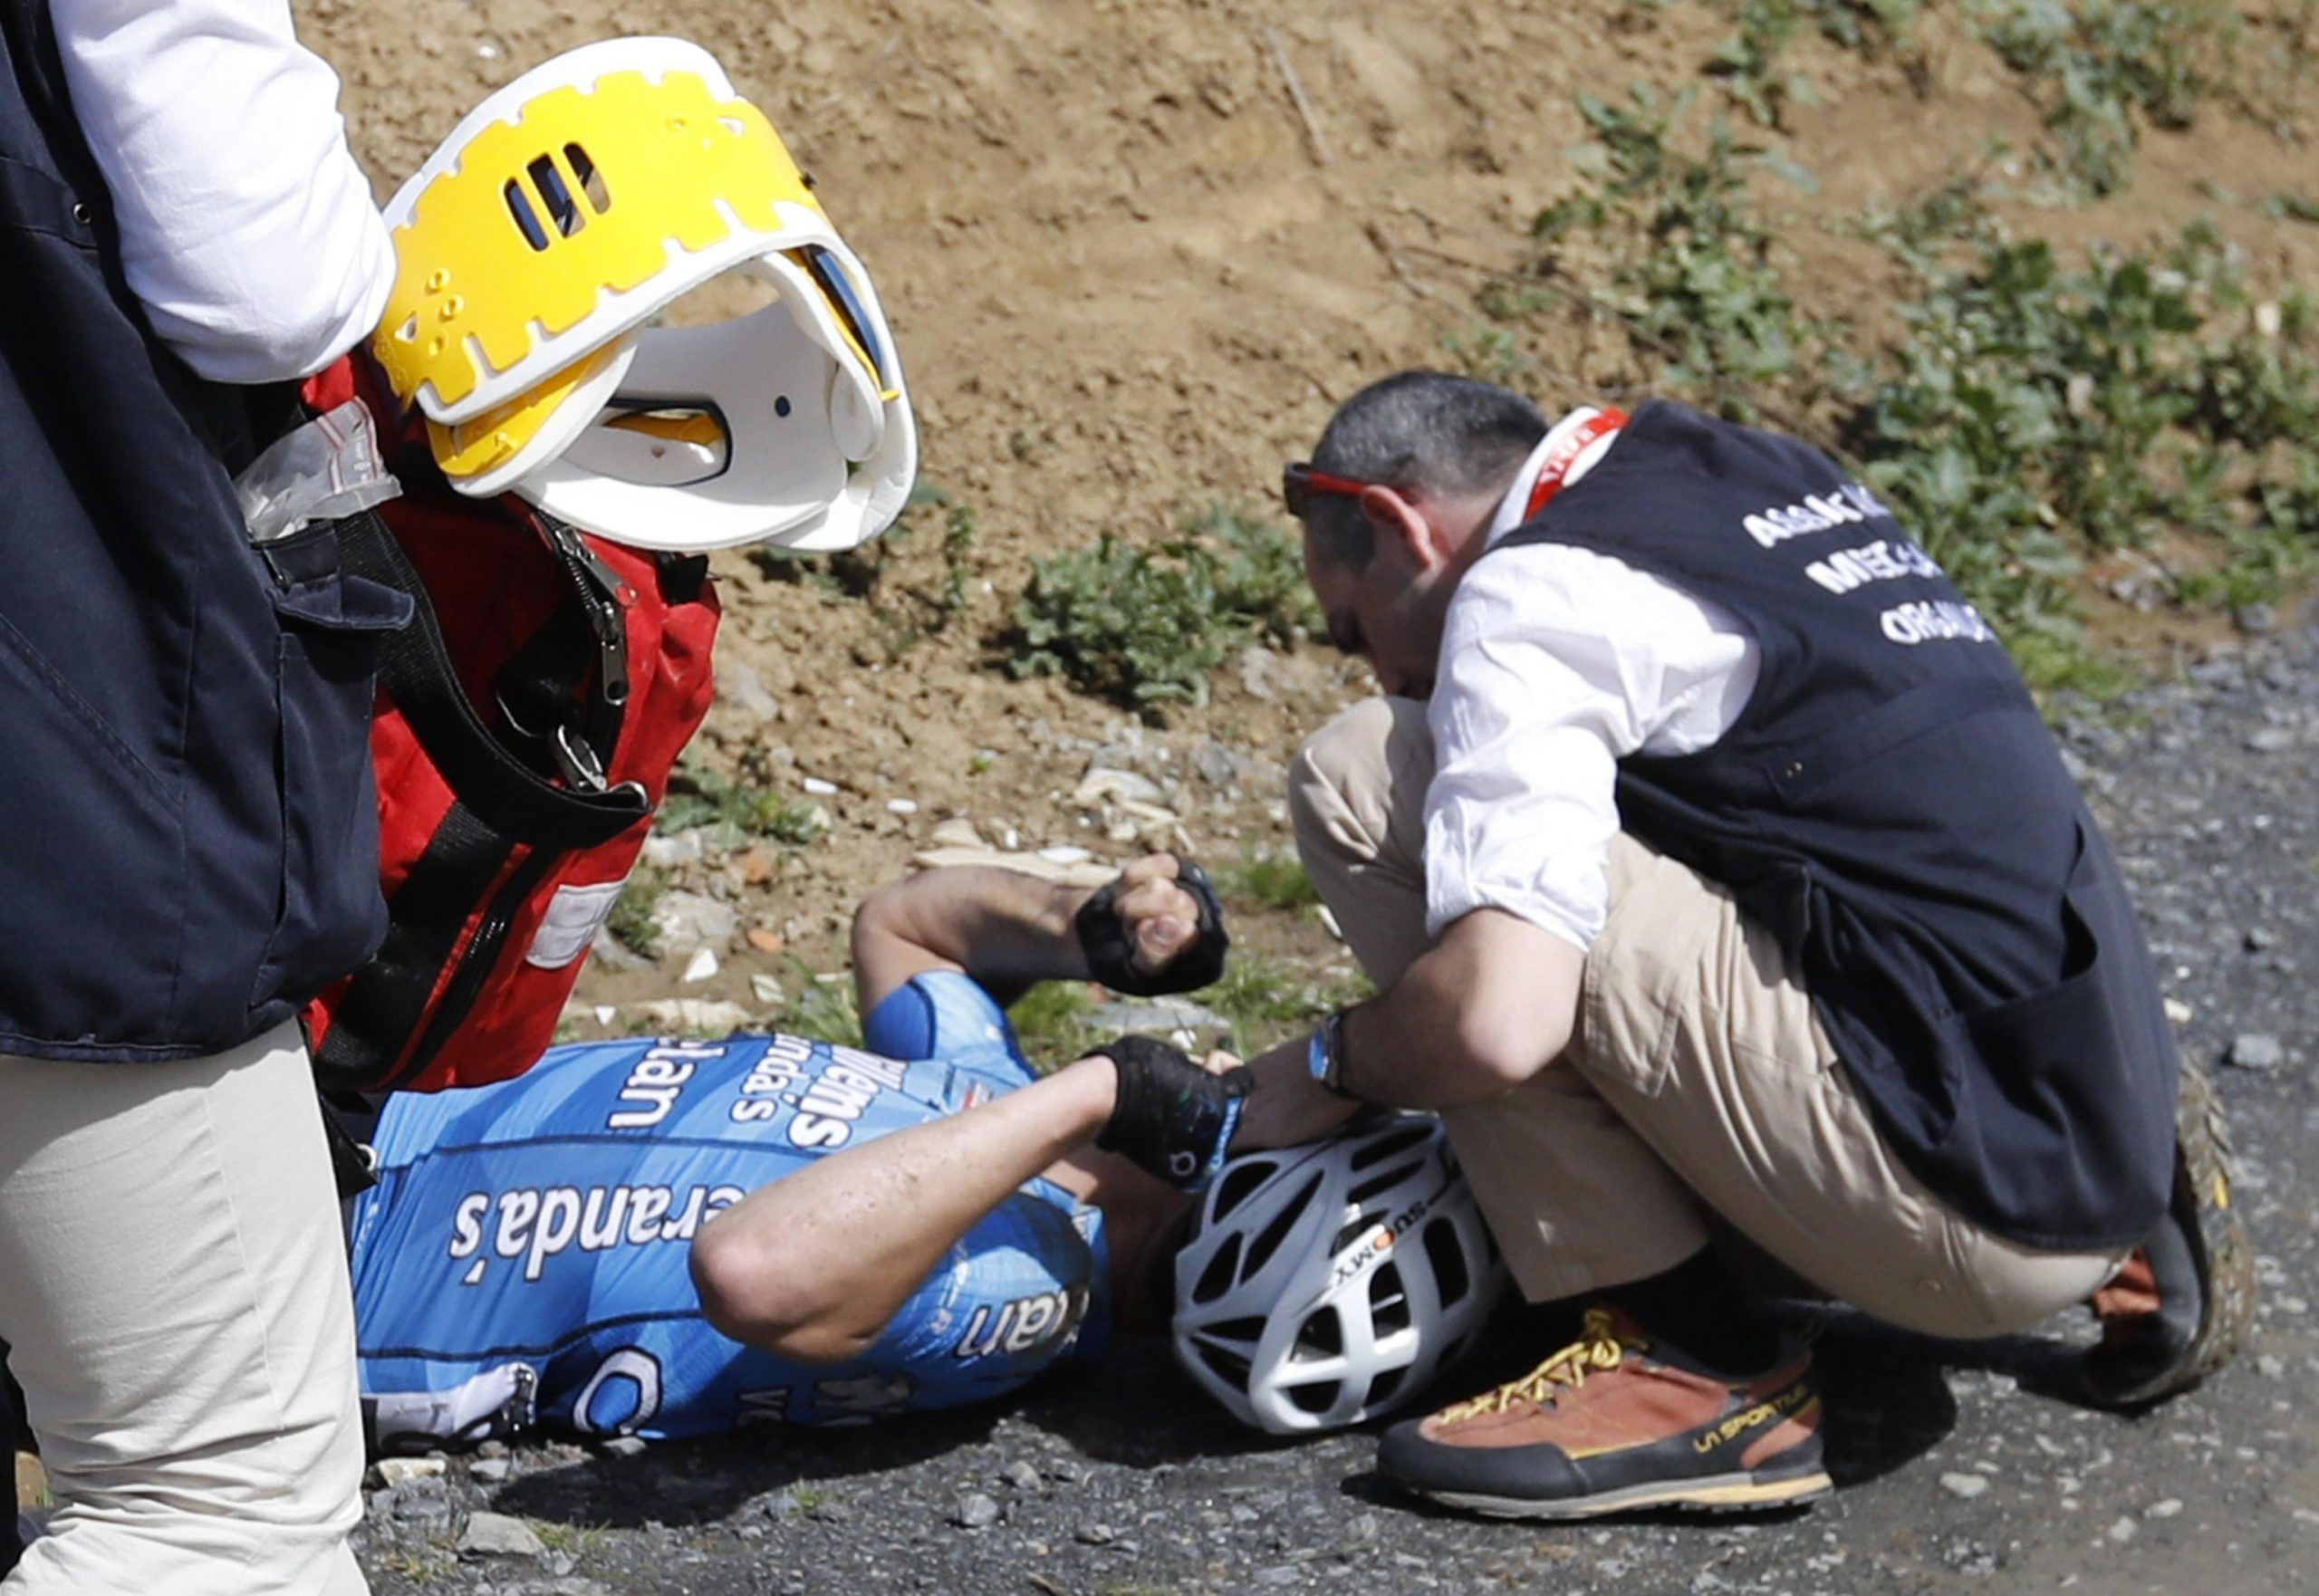 Ciclismo Roubaix caduta e arresto cardiaco Goolaerts